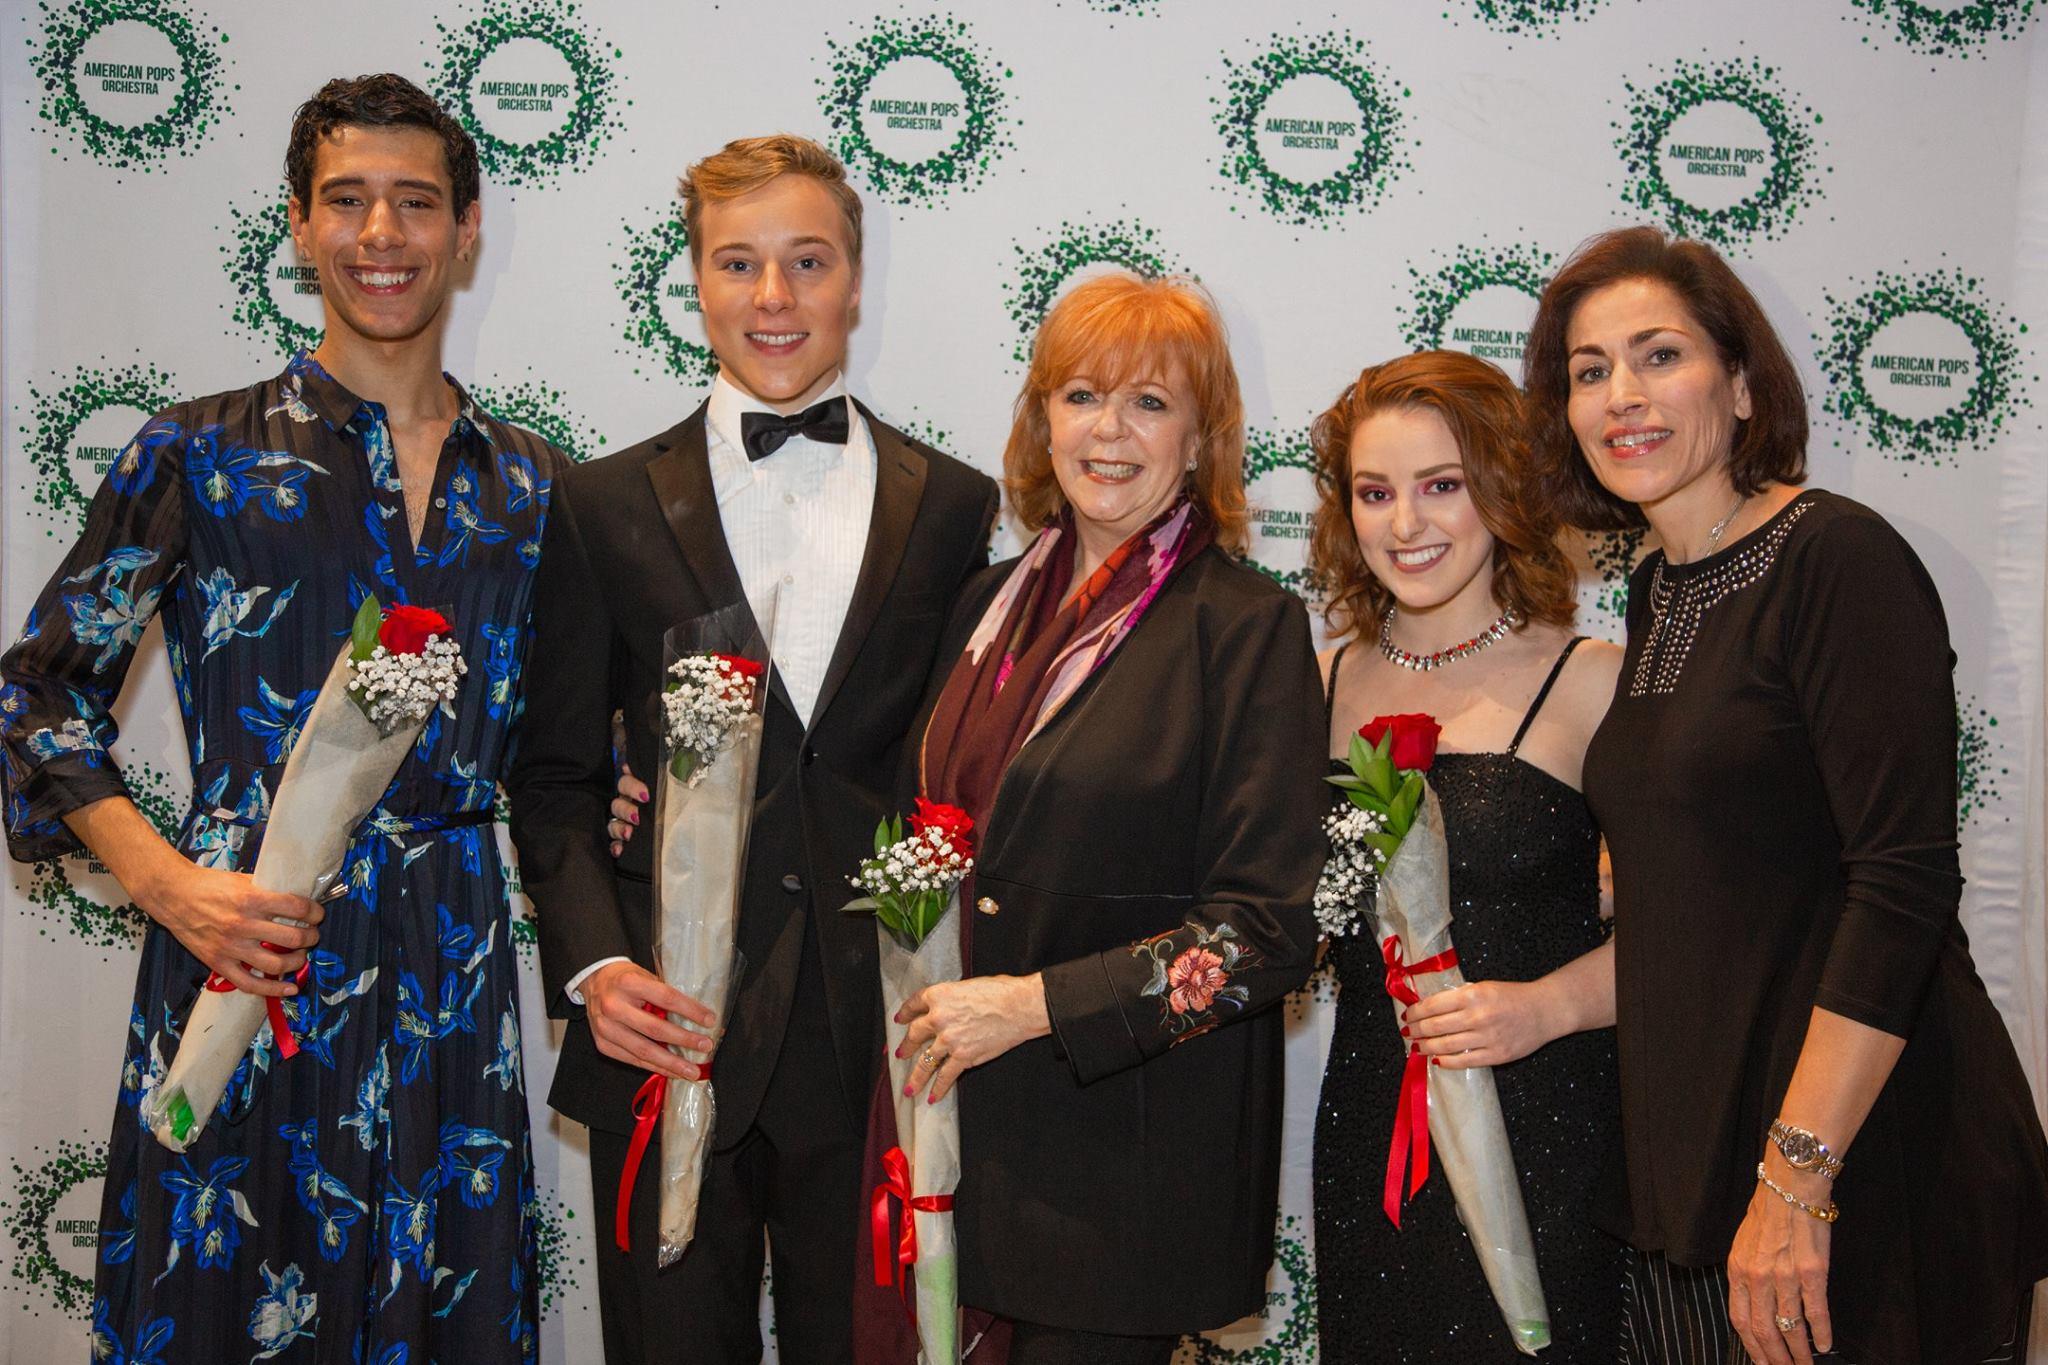 with winners & classmates José Raúl Mangual and Kodiak Thompson, Karma Camp, and Rachelle Fleming